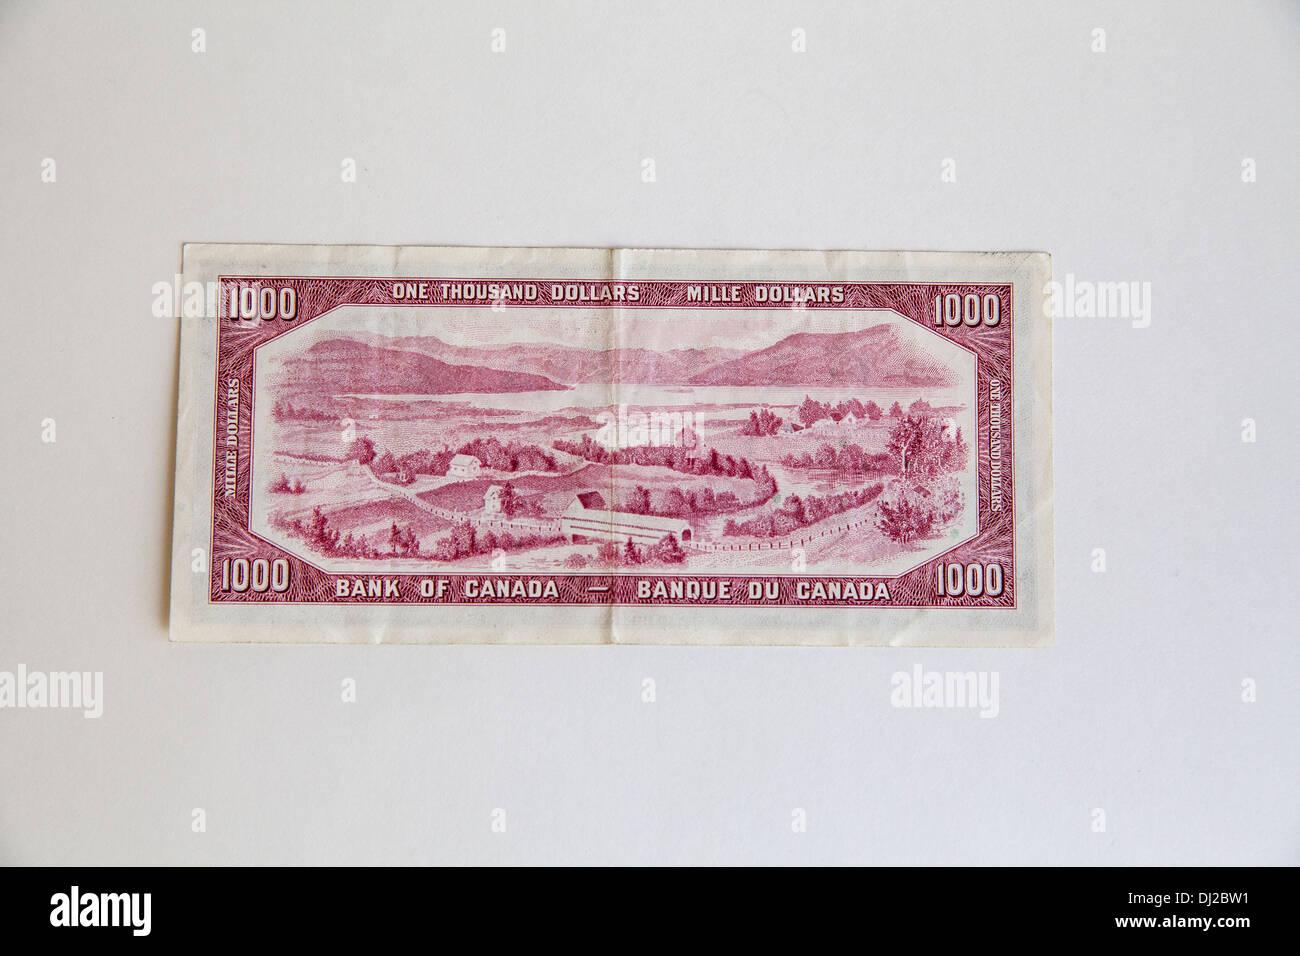 1000 dollar bill stock photos 1000 dollar bill stock images alamy